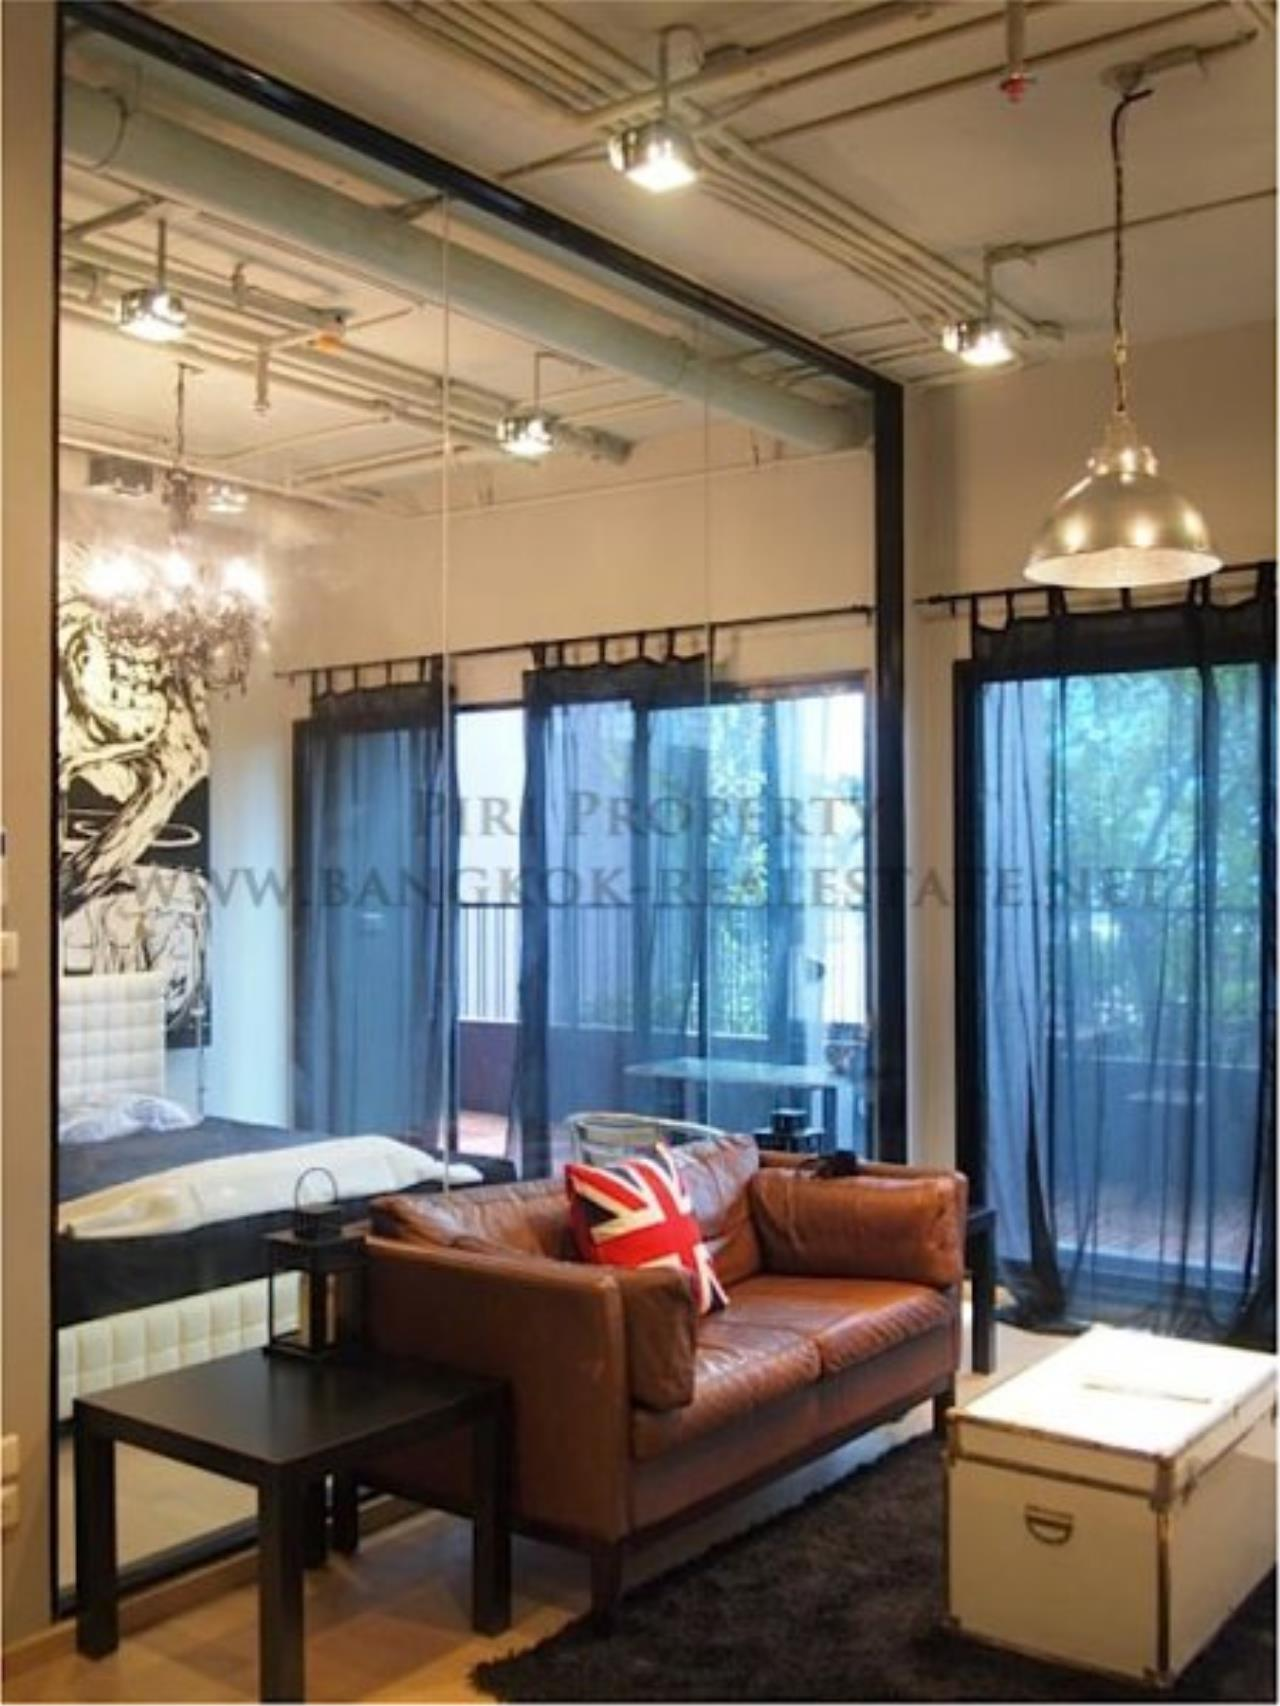 Piri Property Agency's One Bedroom Condo - Noble Reveal next to Gateway Ekkamai 5